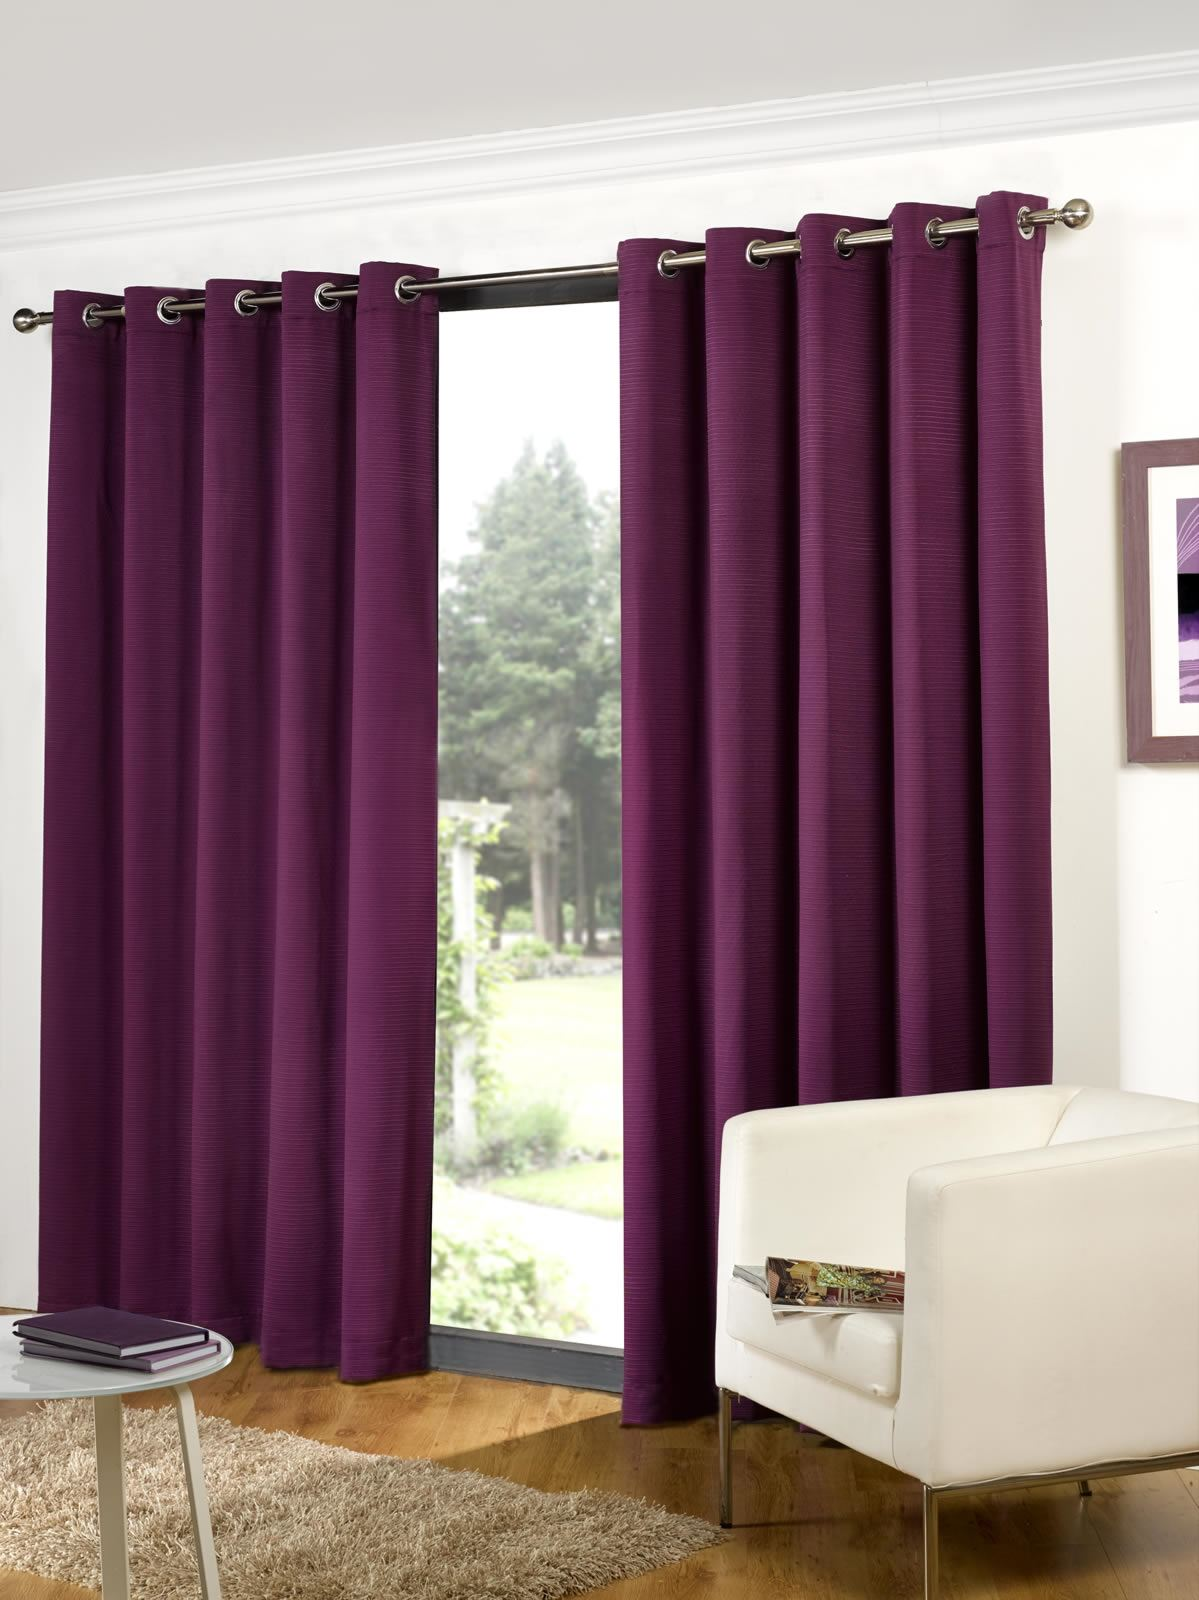 Curtains on clearance